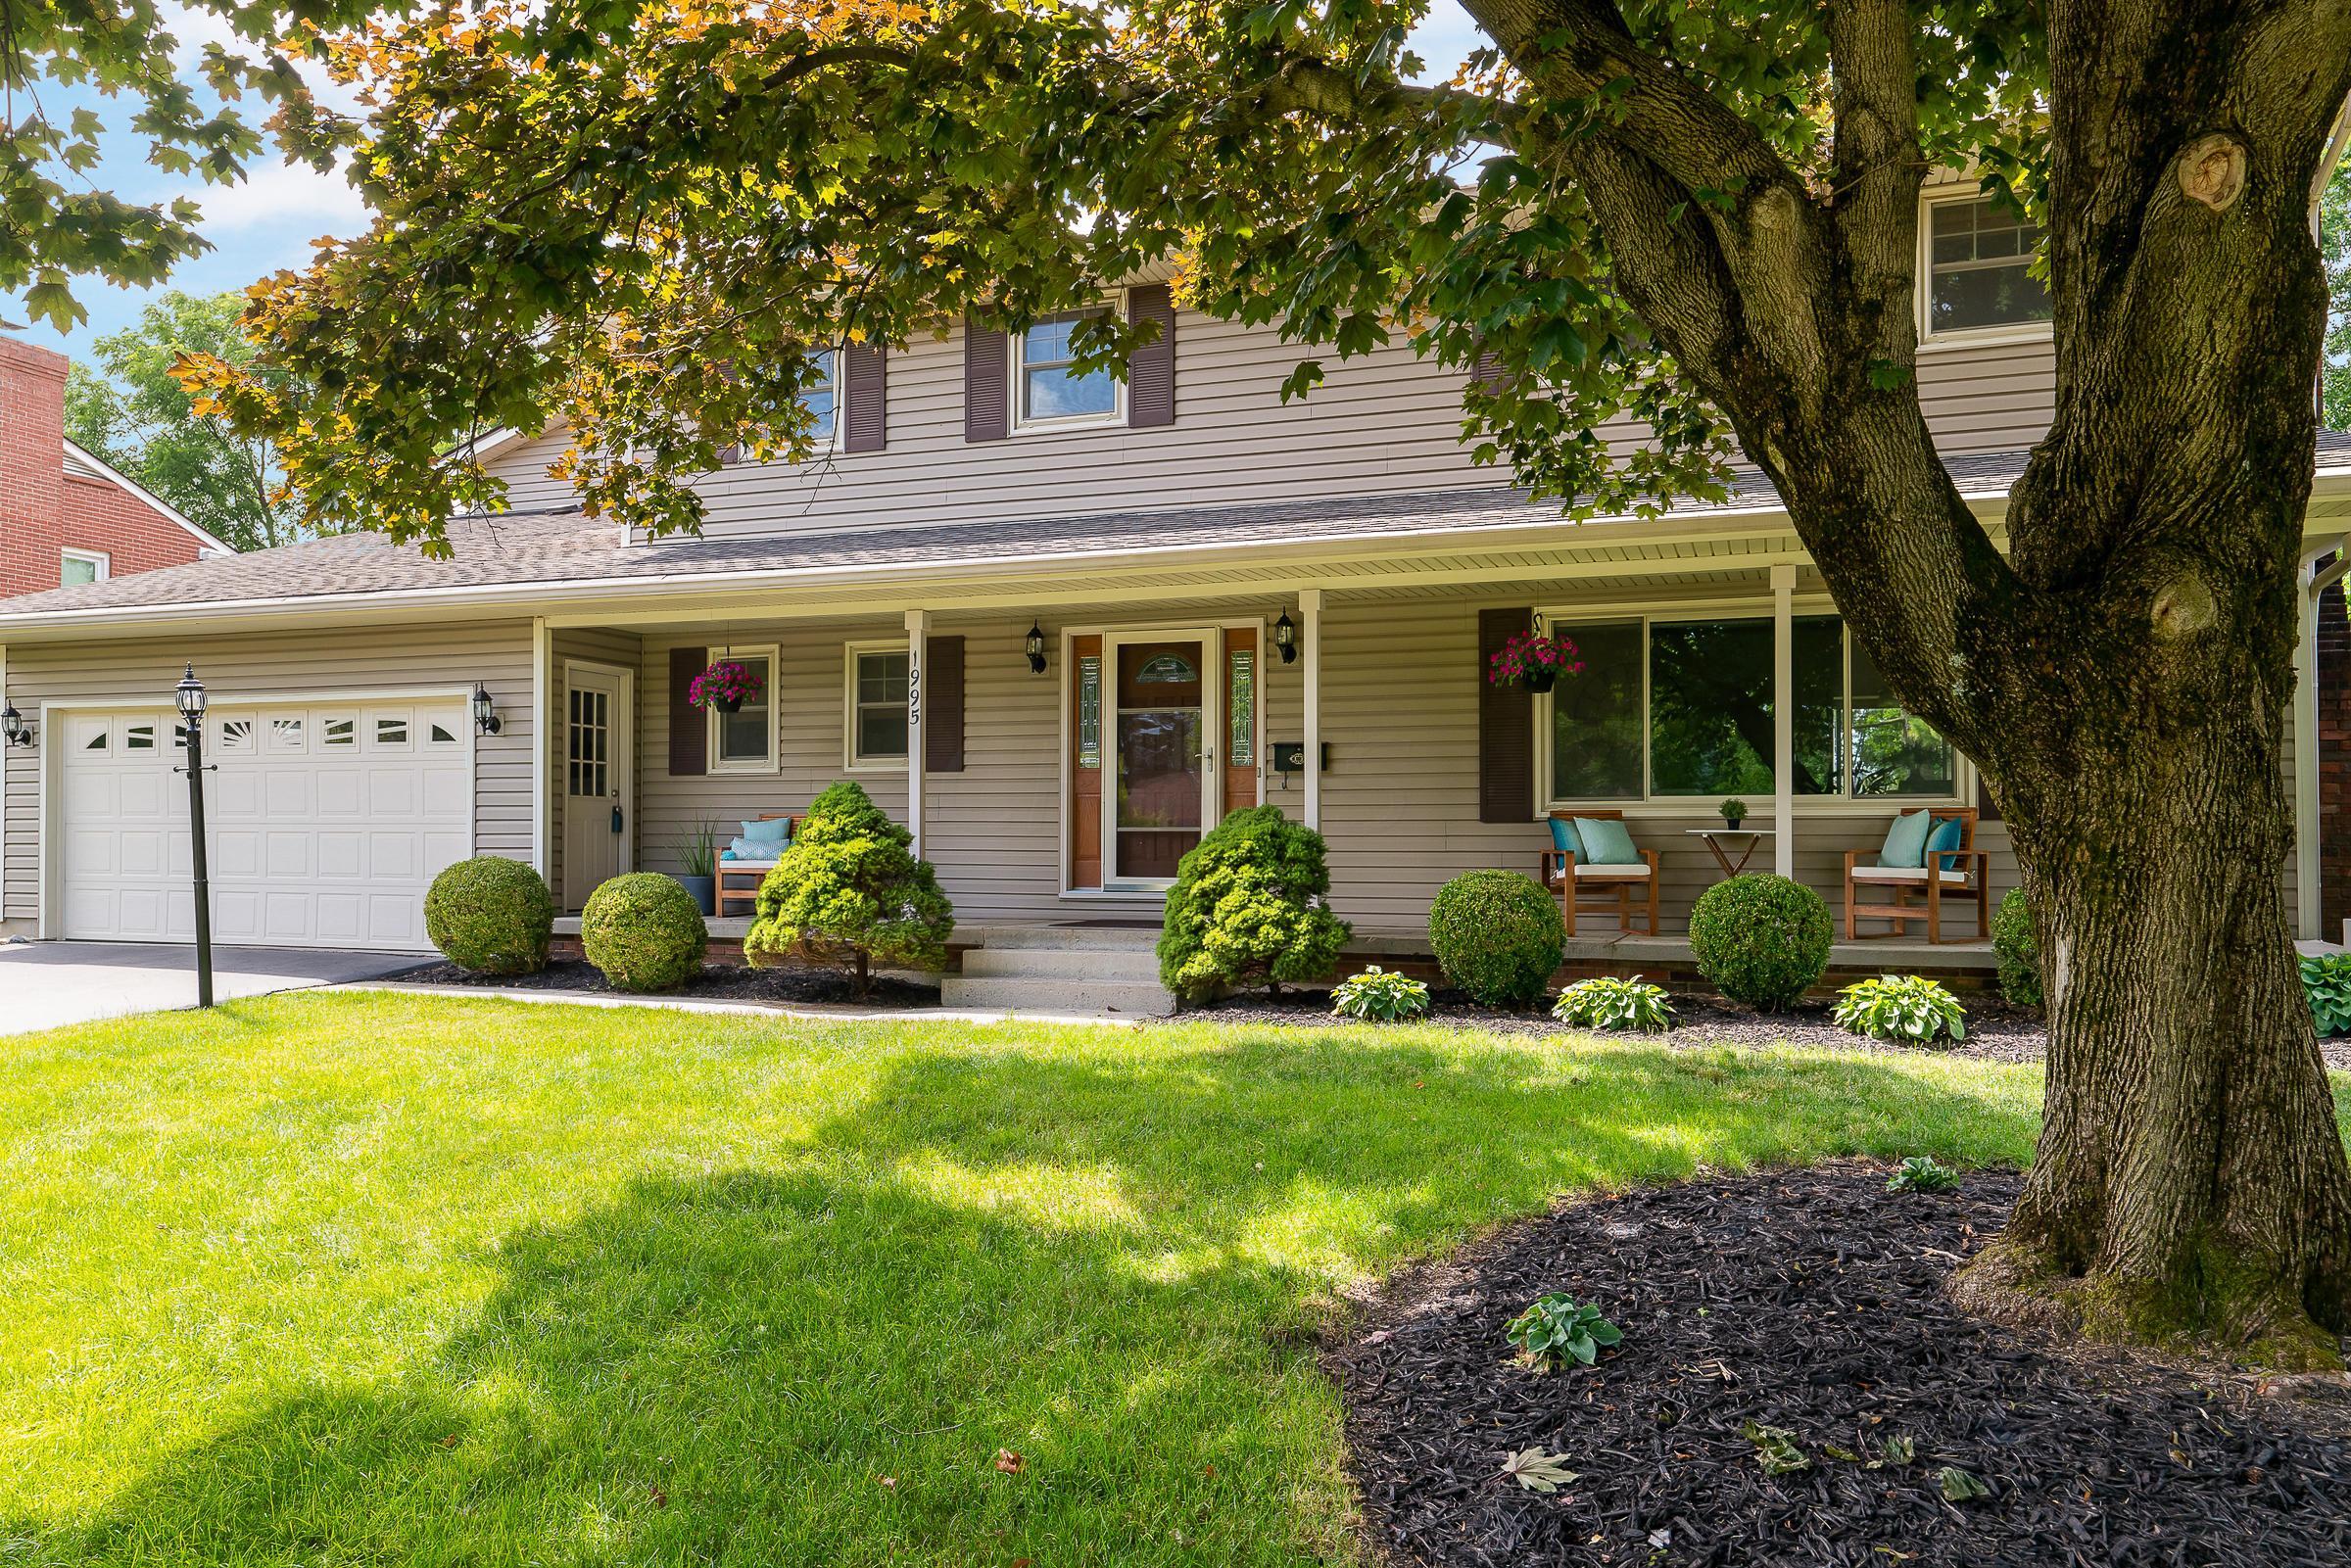 1995 Hythe Road, Upper Arlington, Ohio 43220, 4 Bedrooms Bedrooms, ,4 BathroomsBathrooms,Residential,For Sale,Hythe,220020494